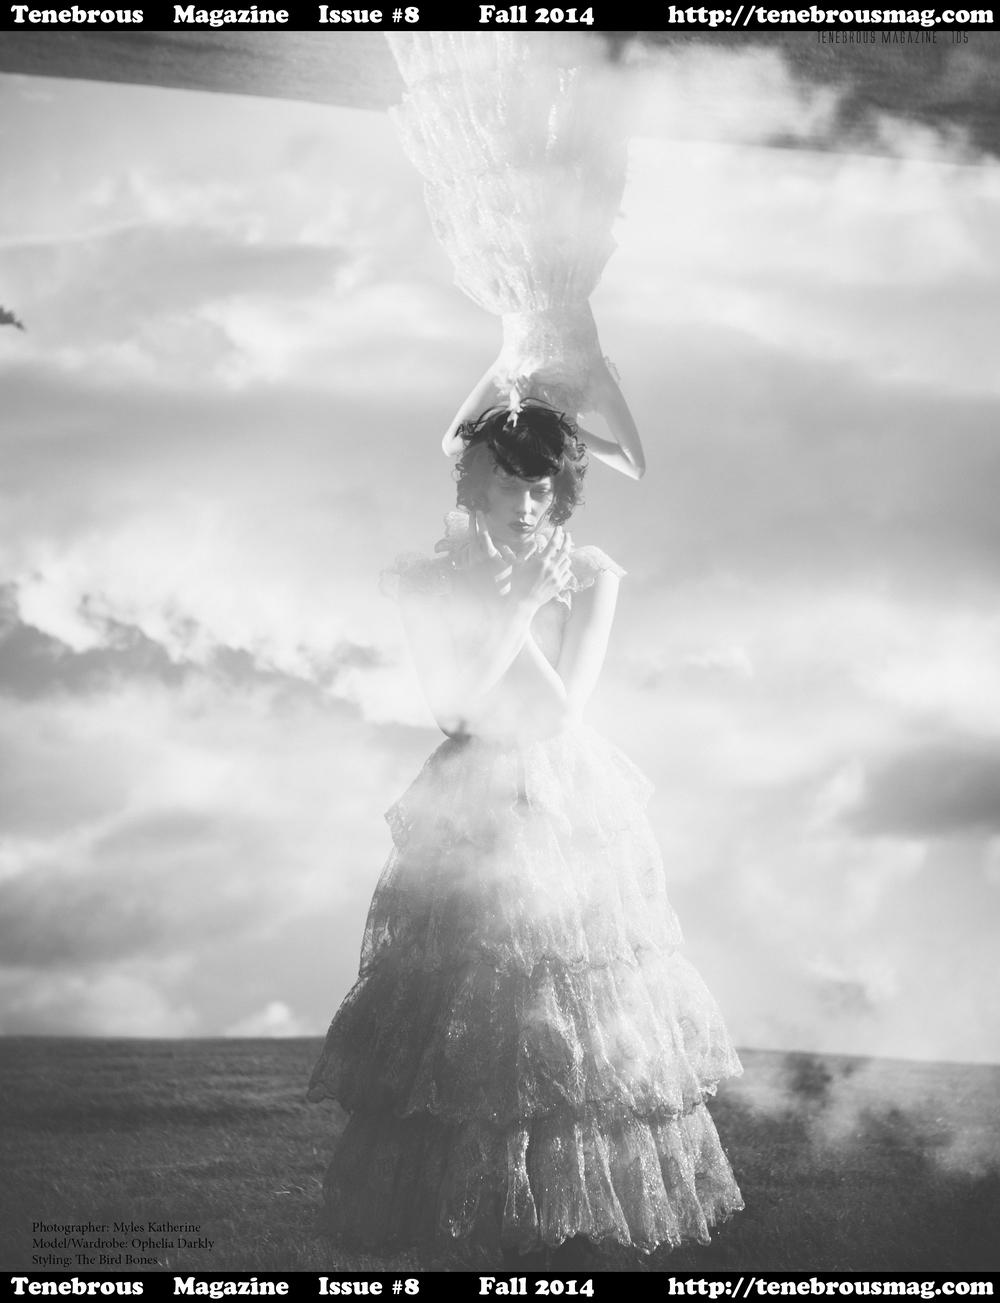 Tenebrous Magazine + Myles Katherine Photography